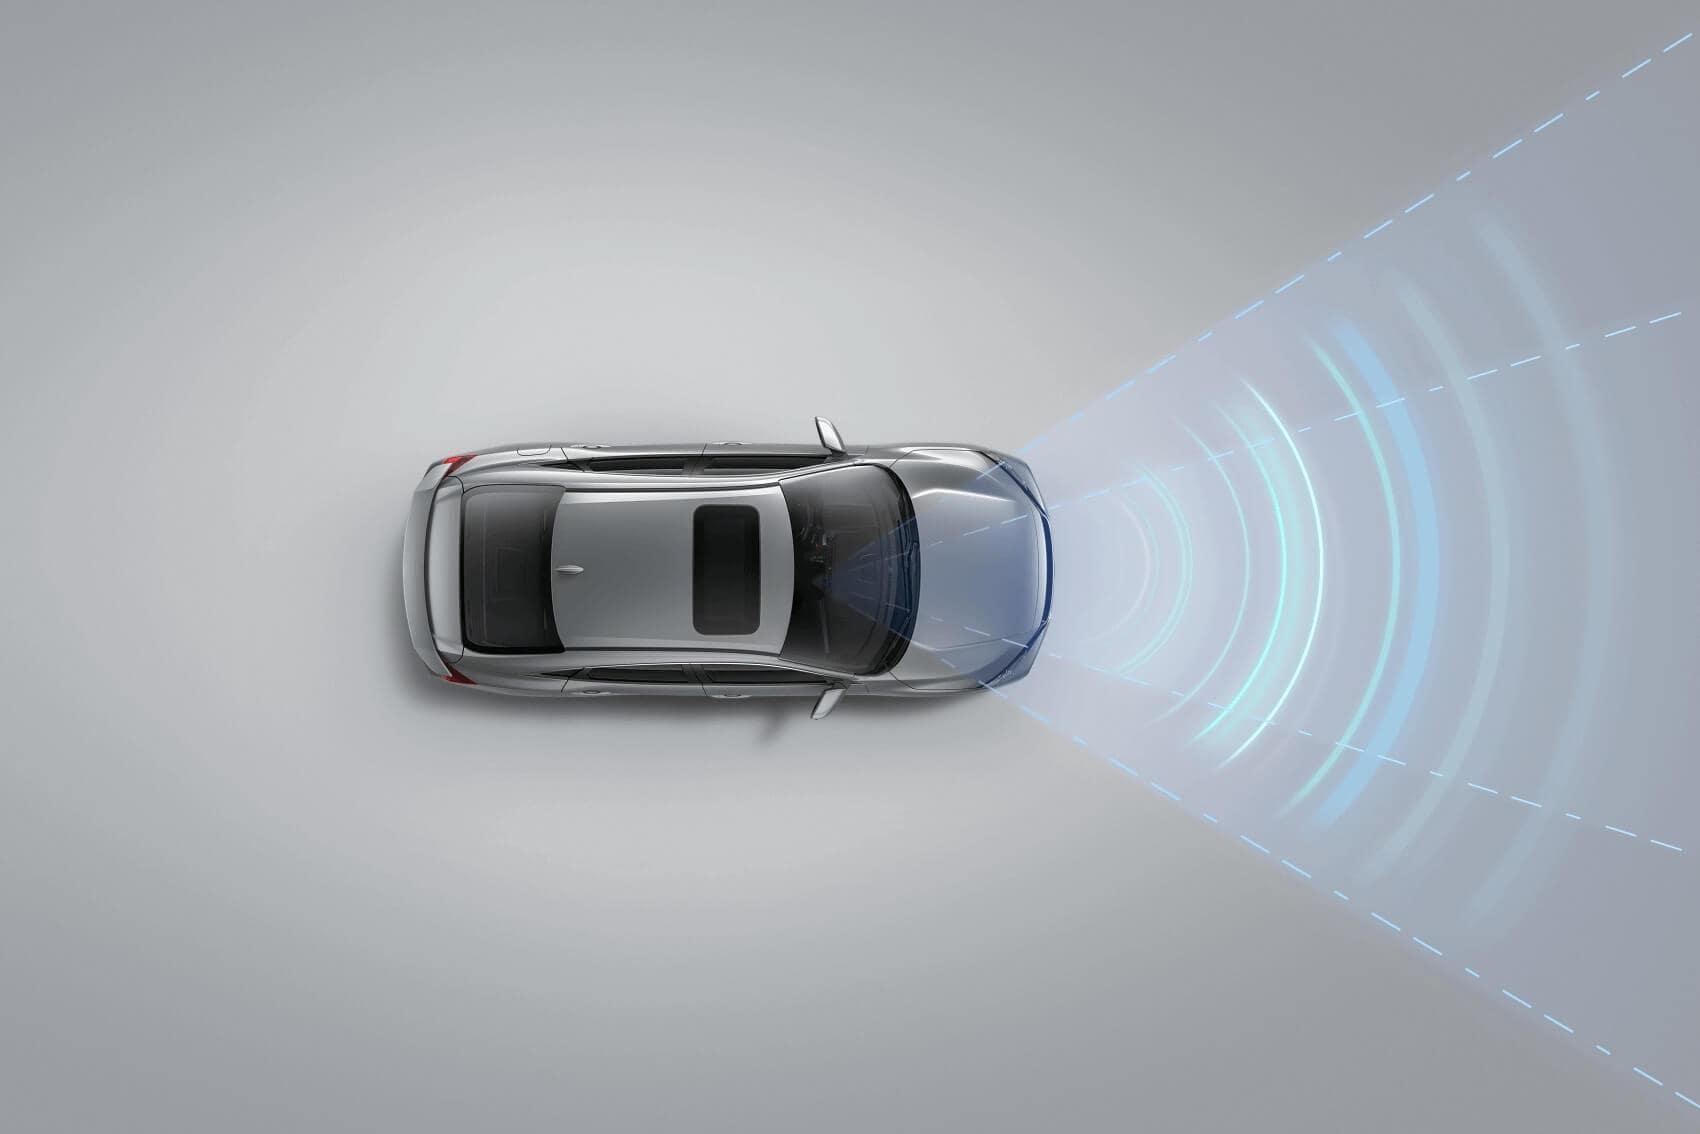 2020 Honda Civic Safety Sensing